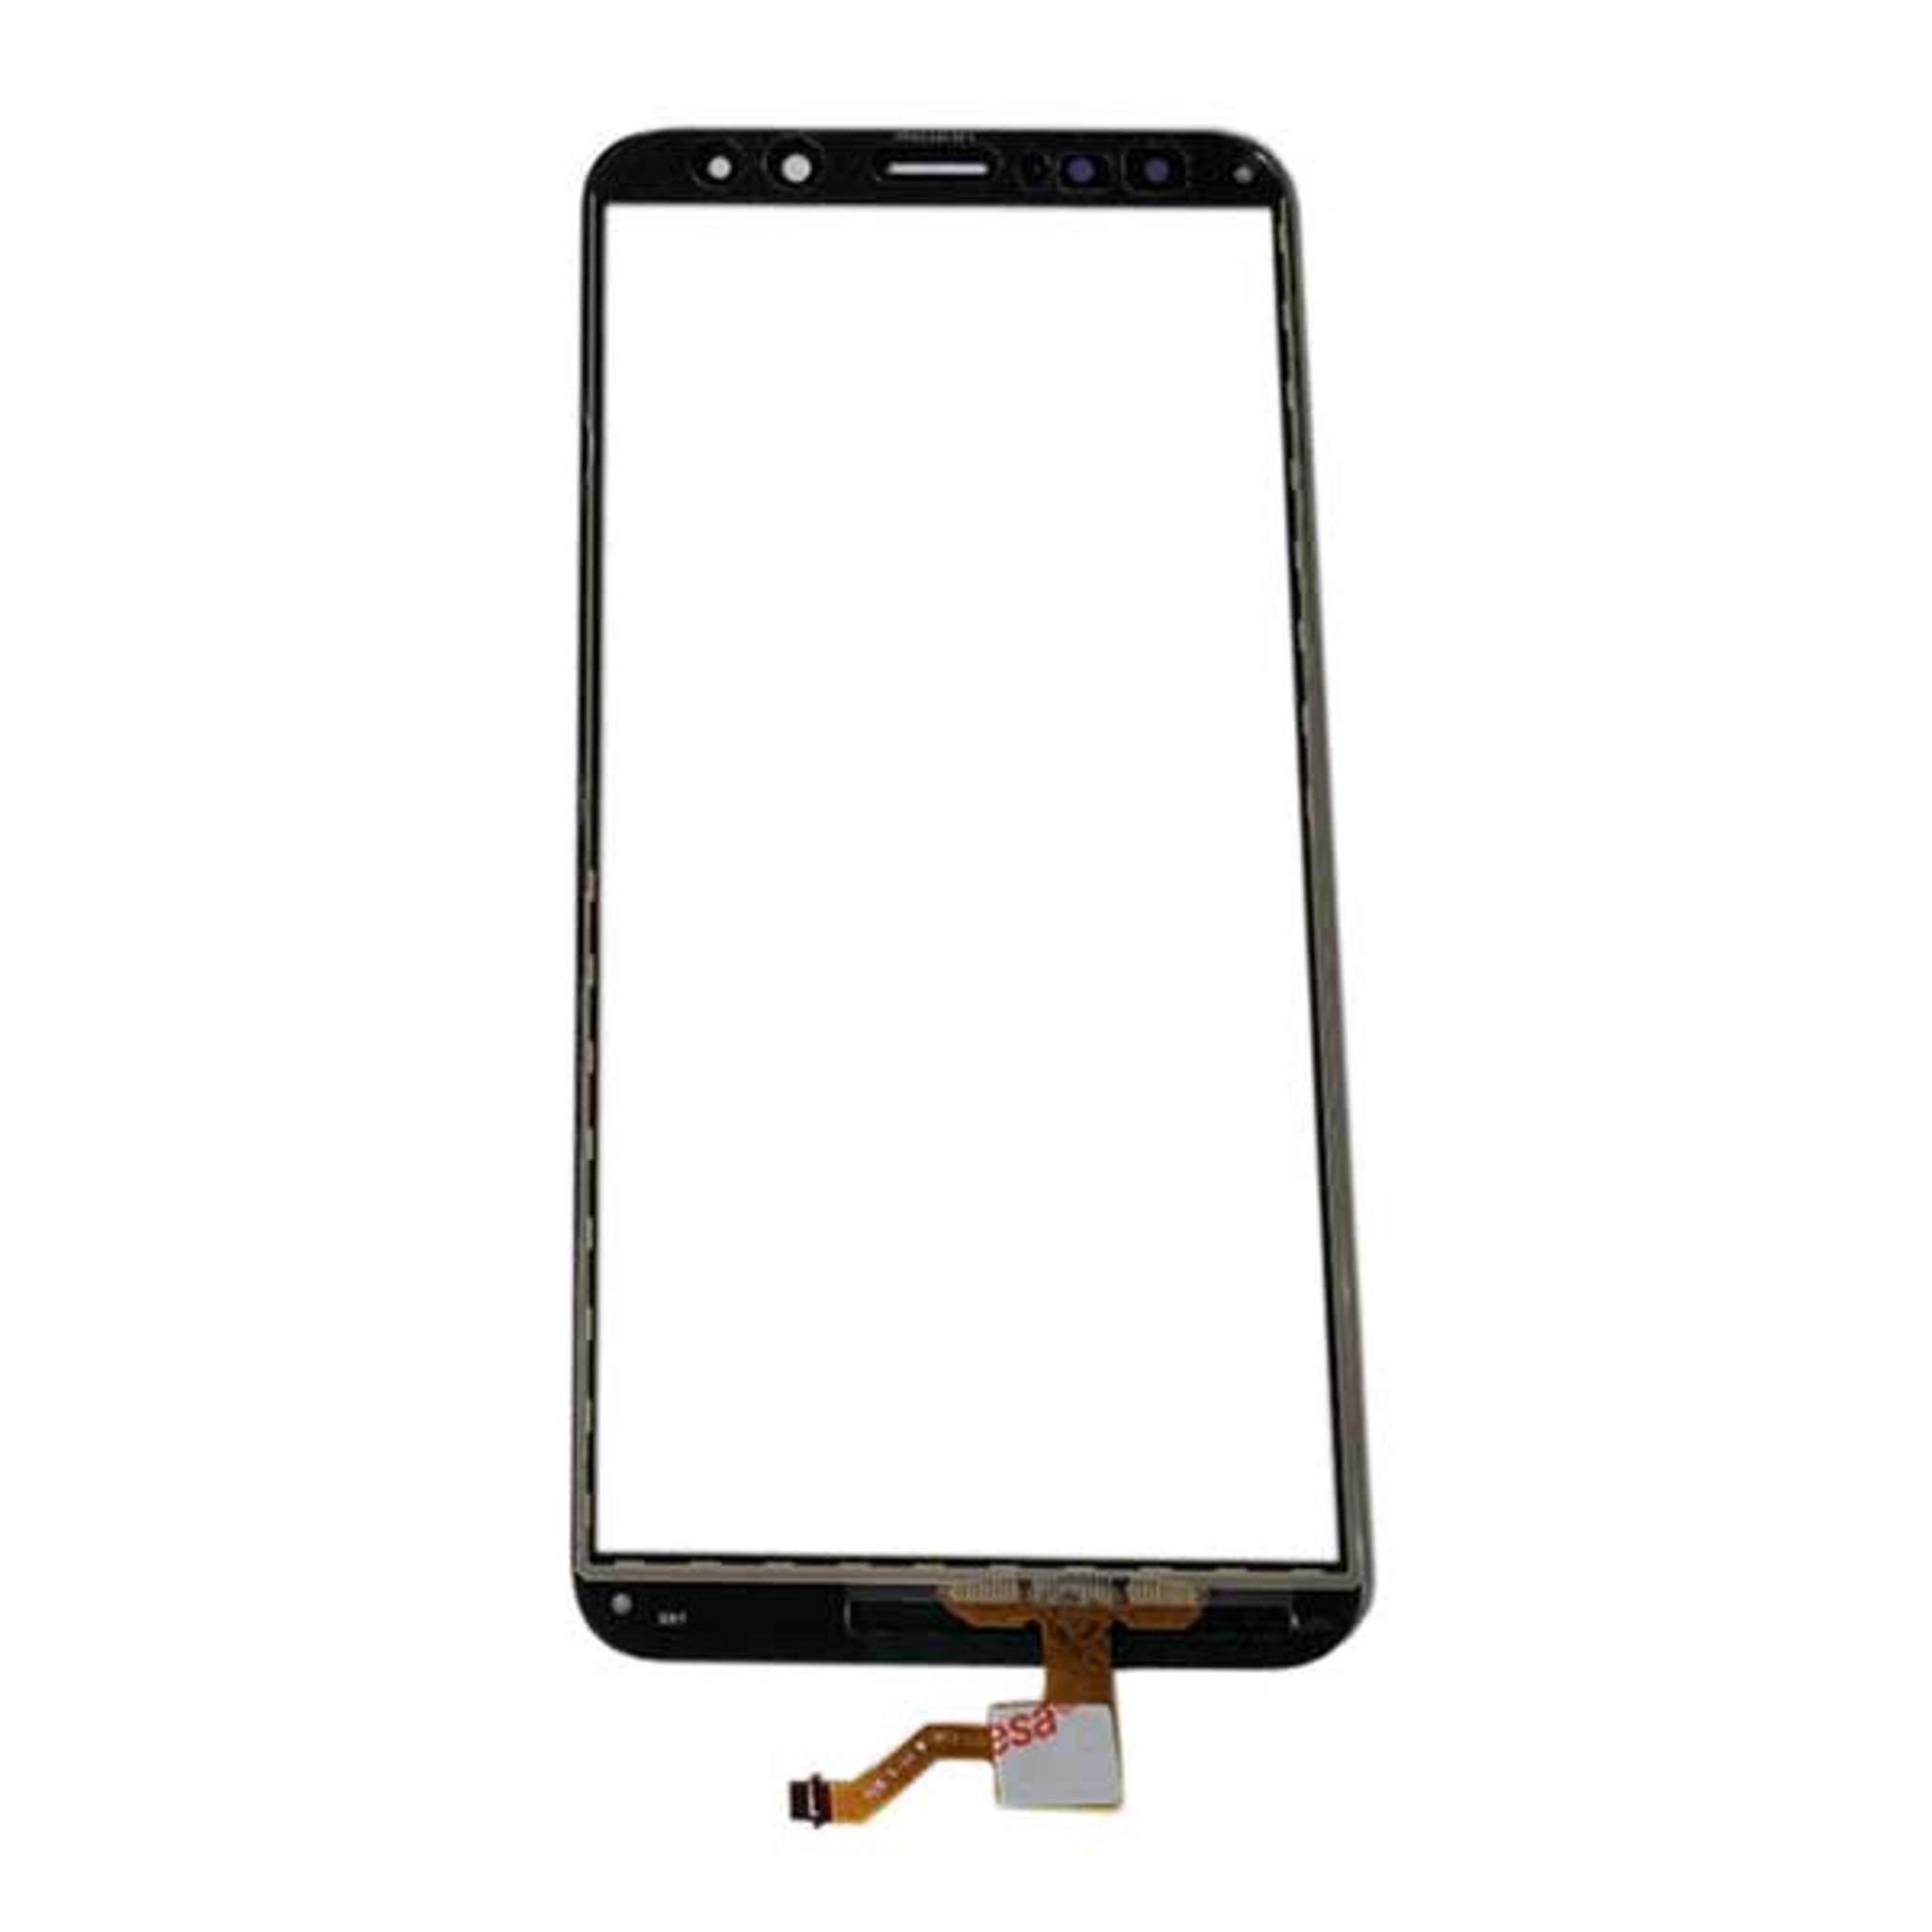 Touch Screen Digitizer for Huawei Mate 10 Lite / G10 / Honor 9i / Nova 2i  -Black